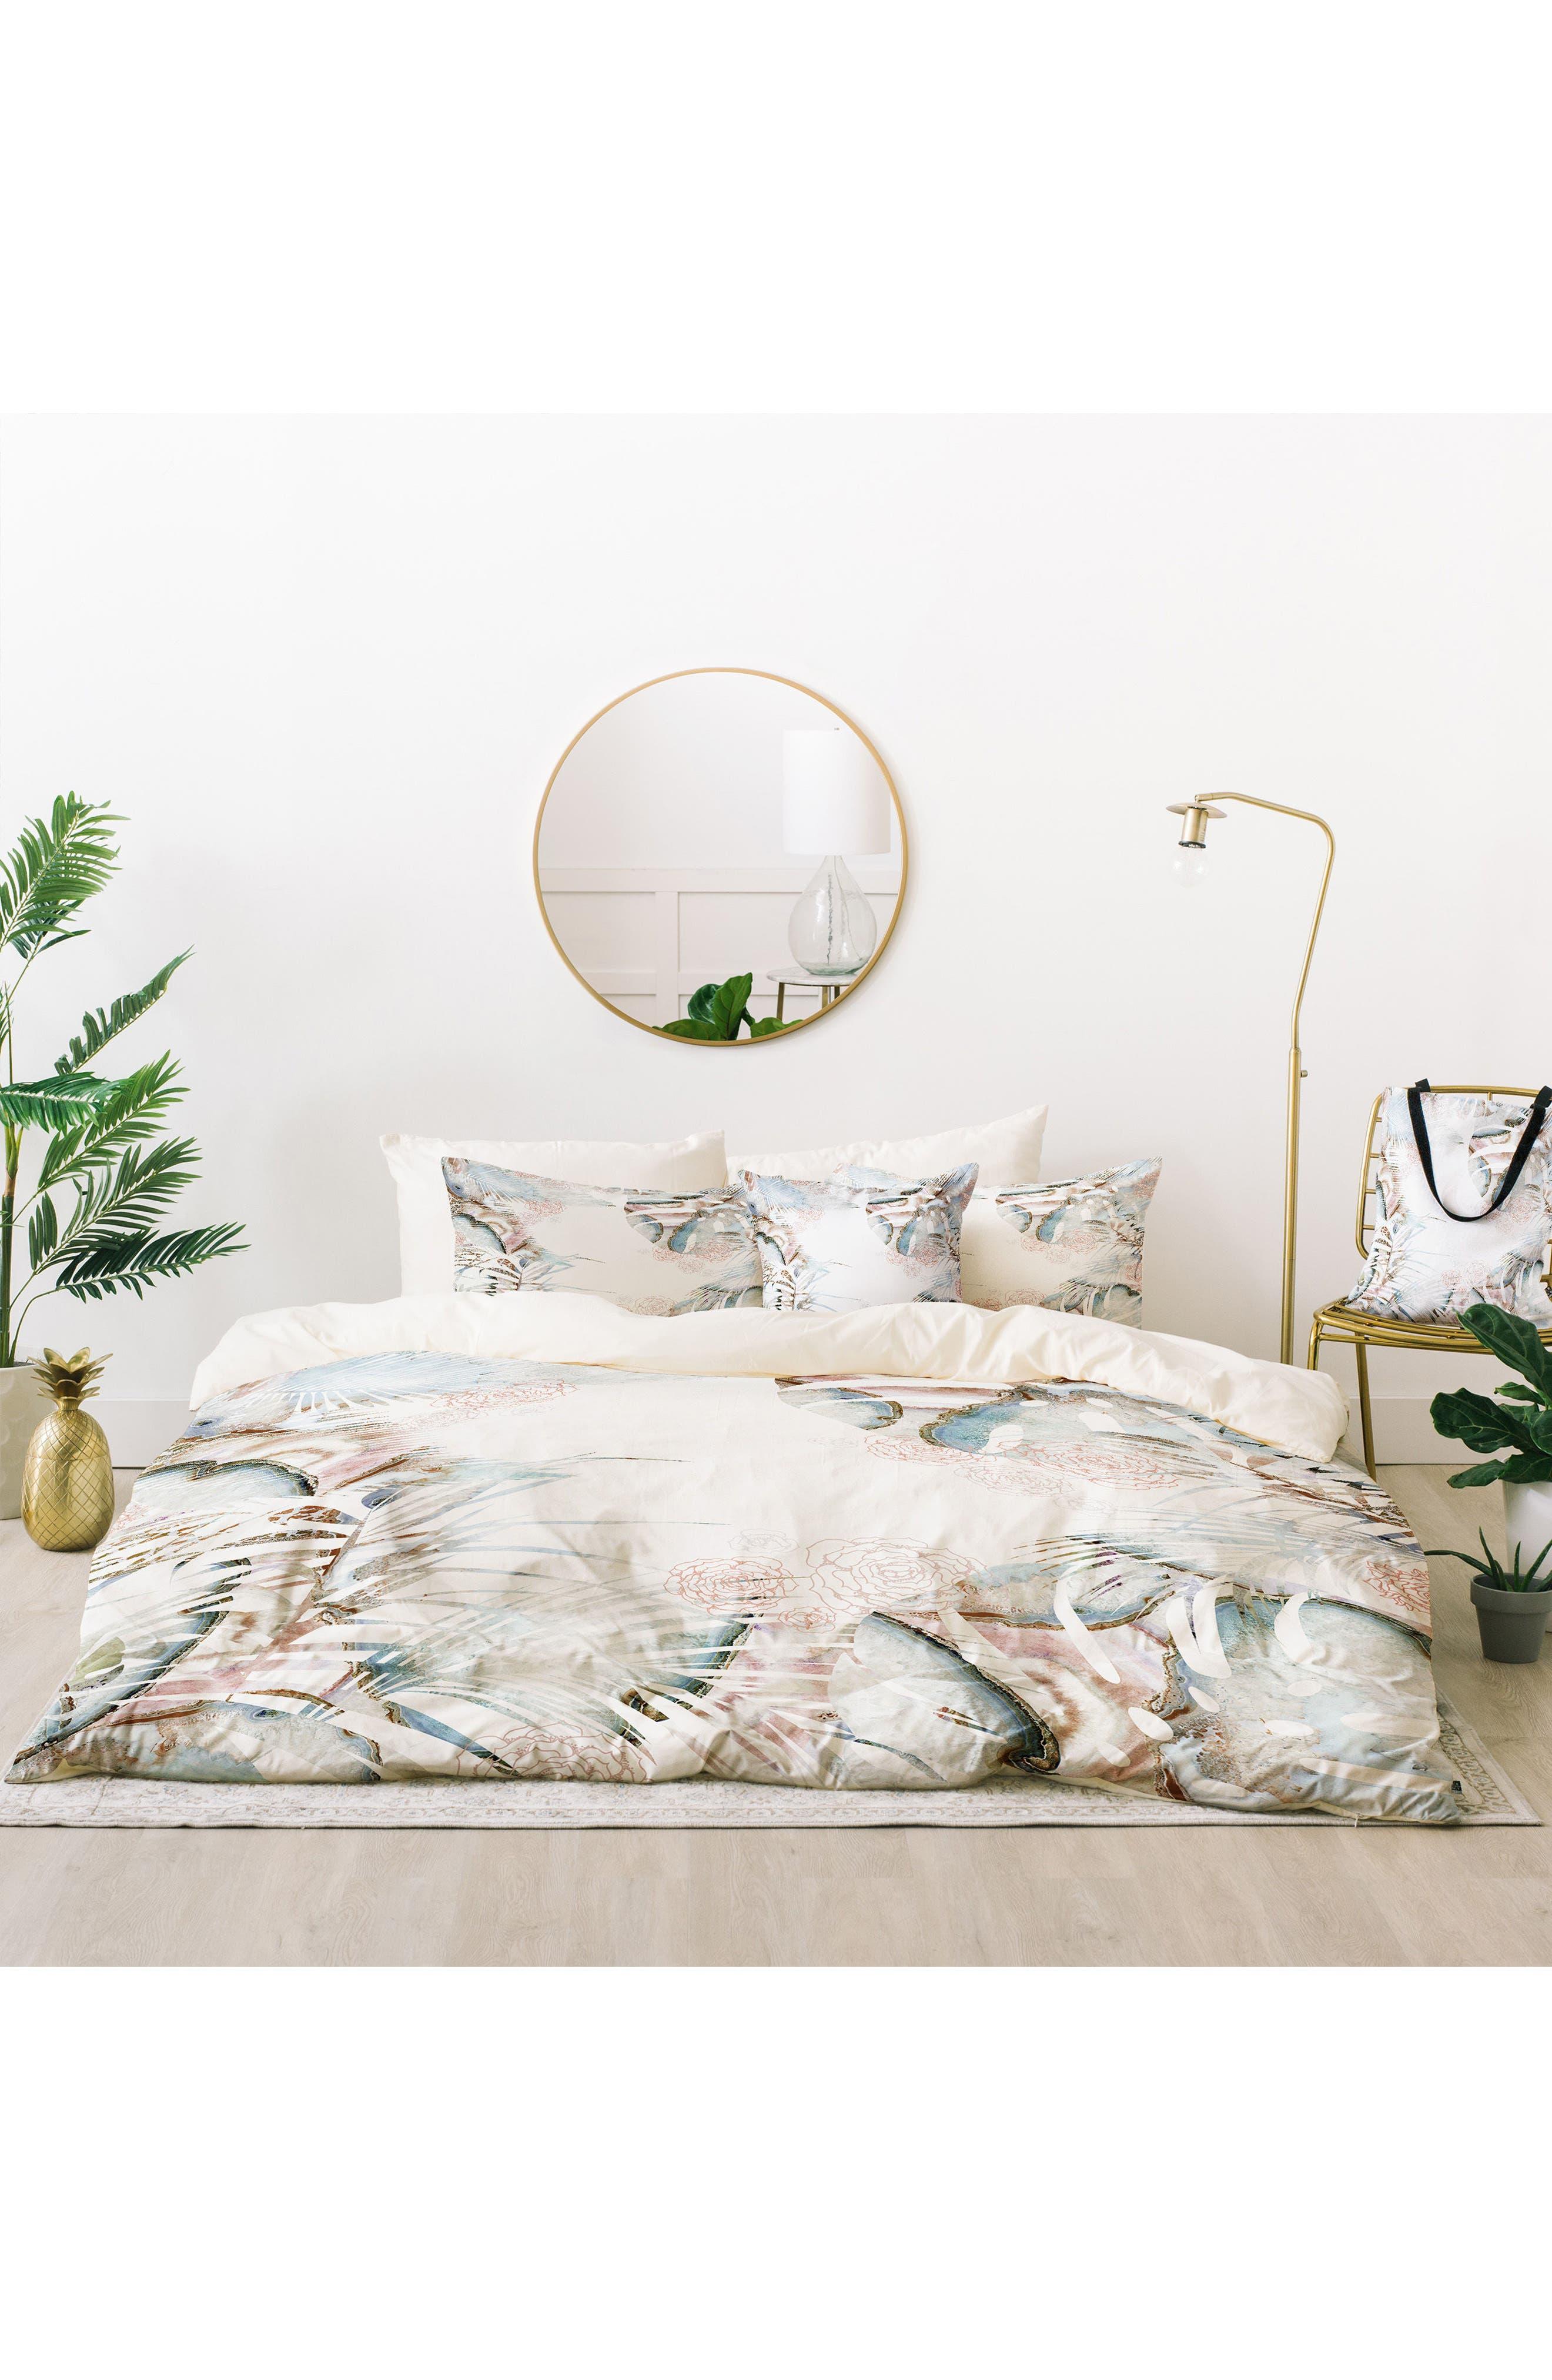 Iveta Abolina Honey It's Nap Time Bed in a Bag Duvet Cover, Sham & Accent Pillow Set,                             Main thumbnail 1, color,                             Blue Multi